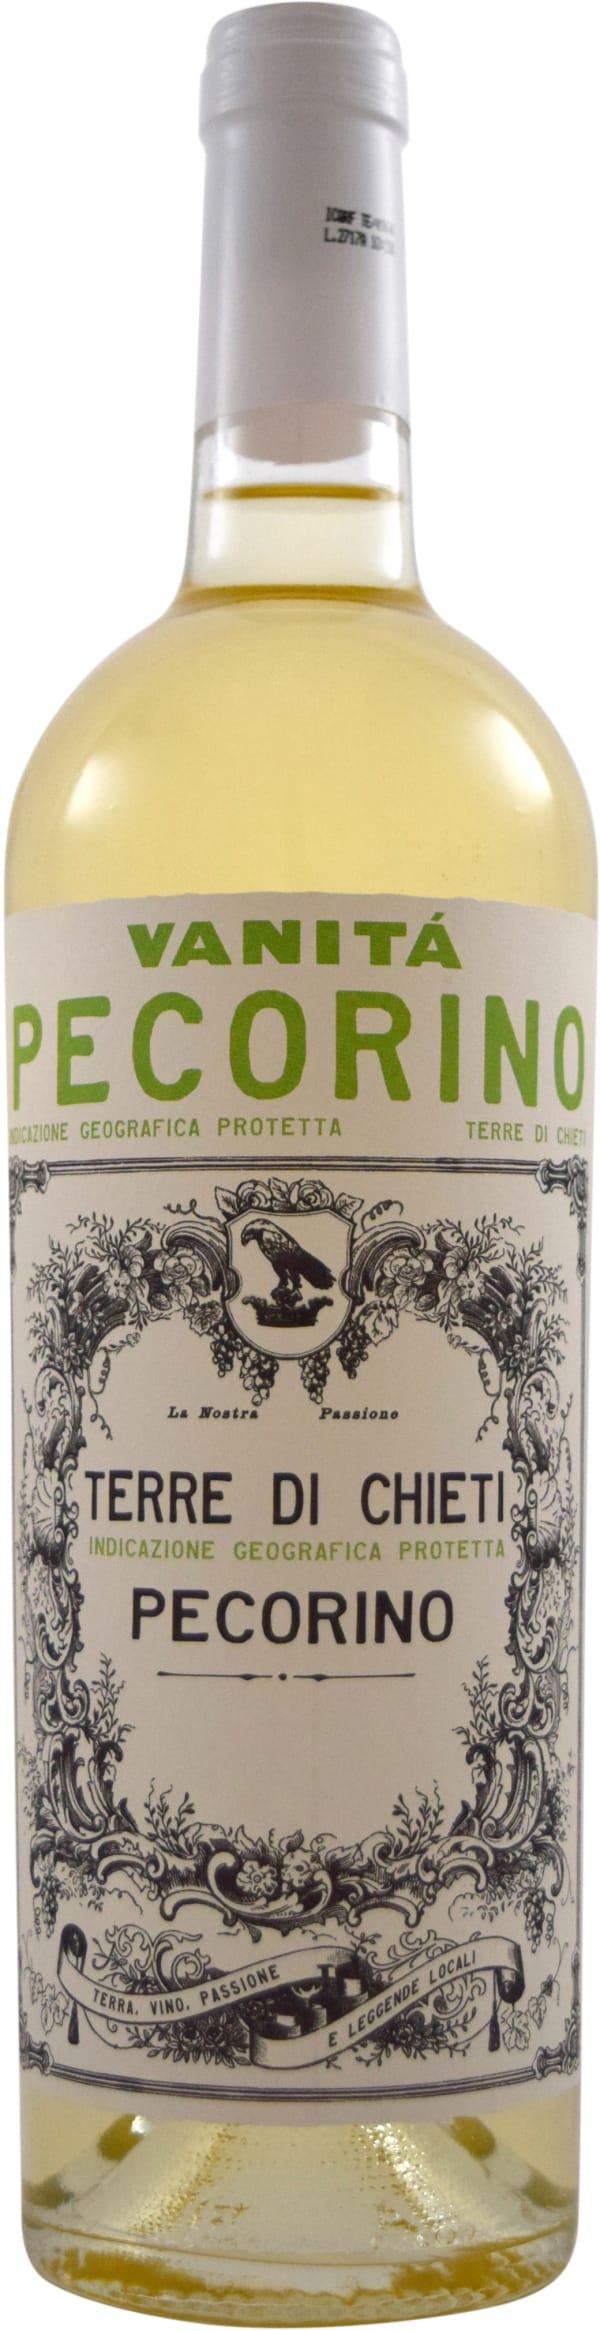 Vanitá Pecorino 2017